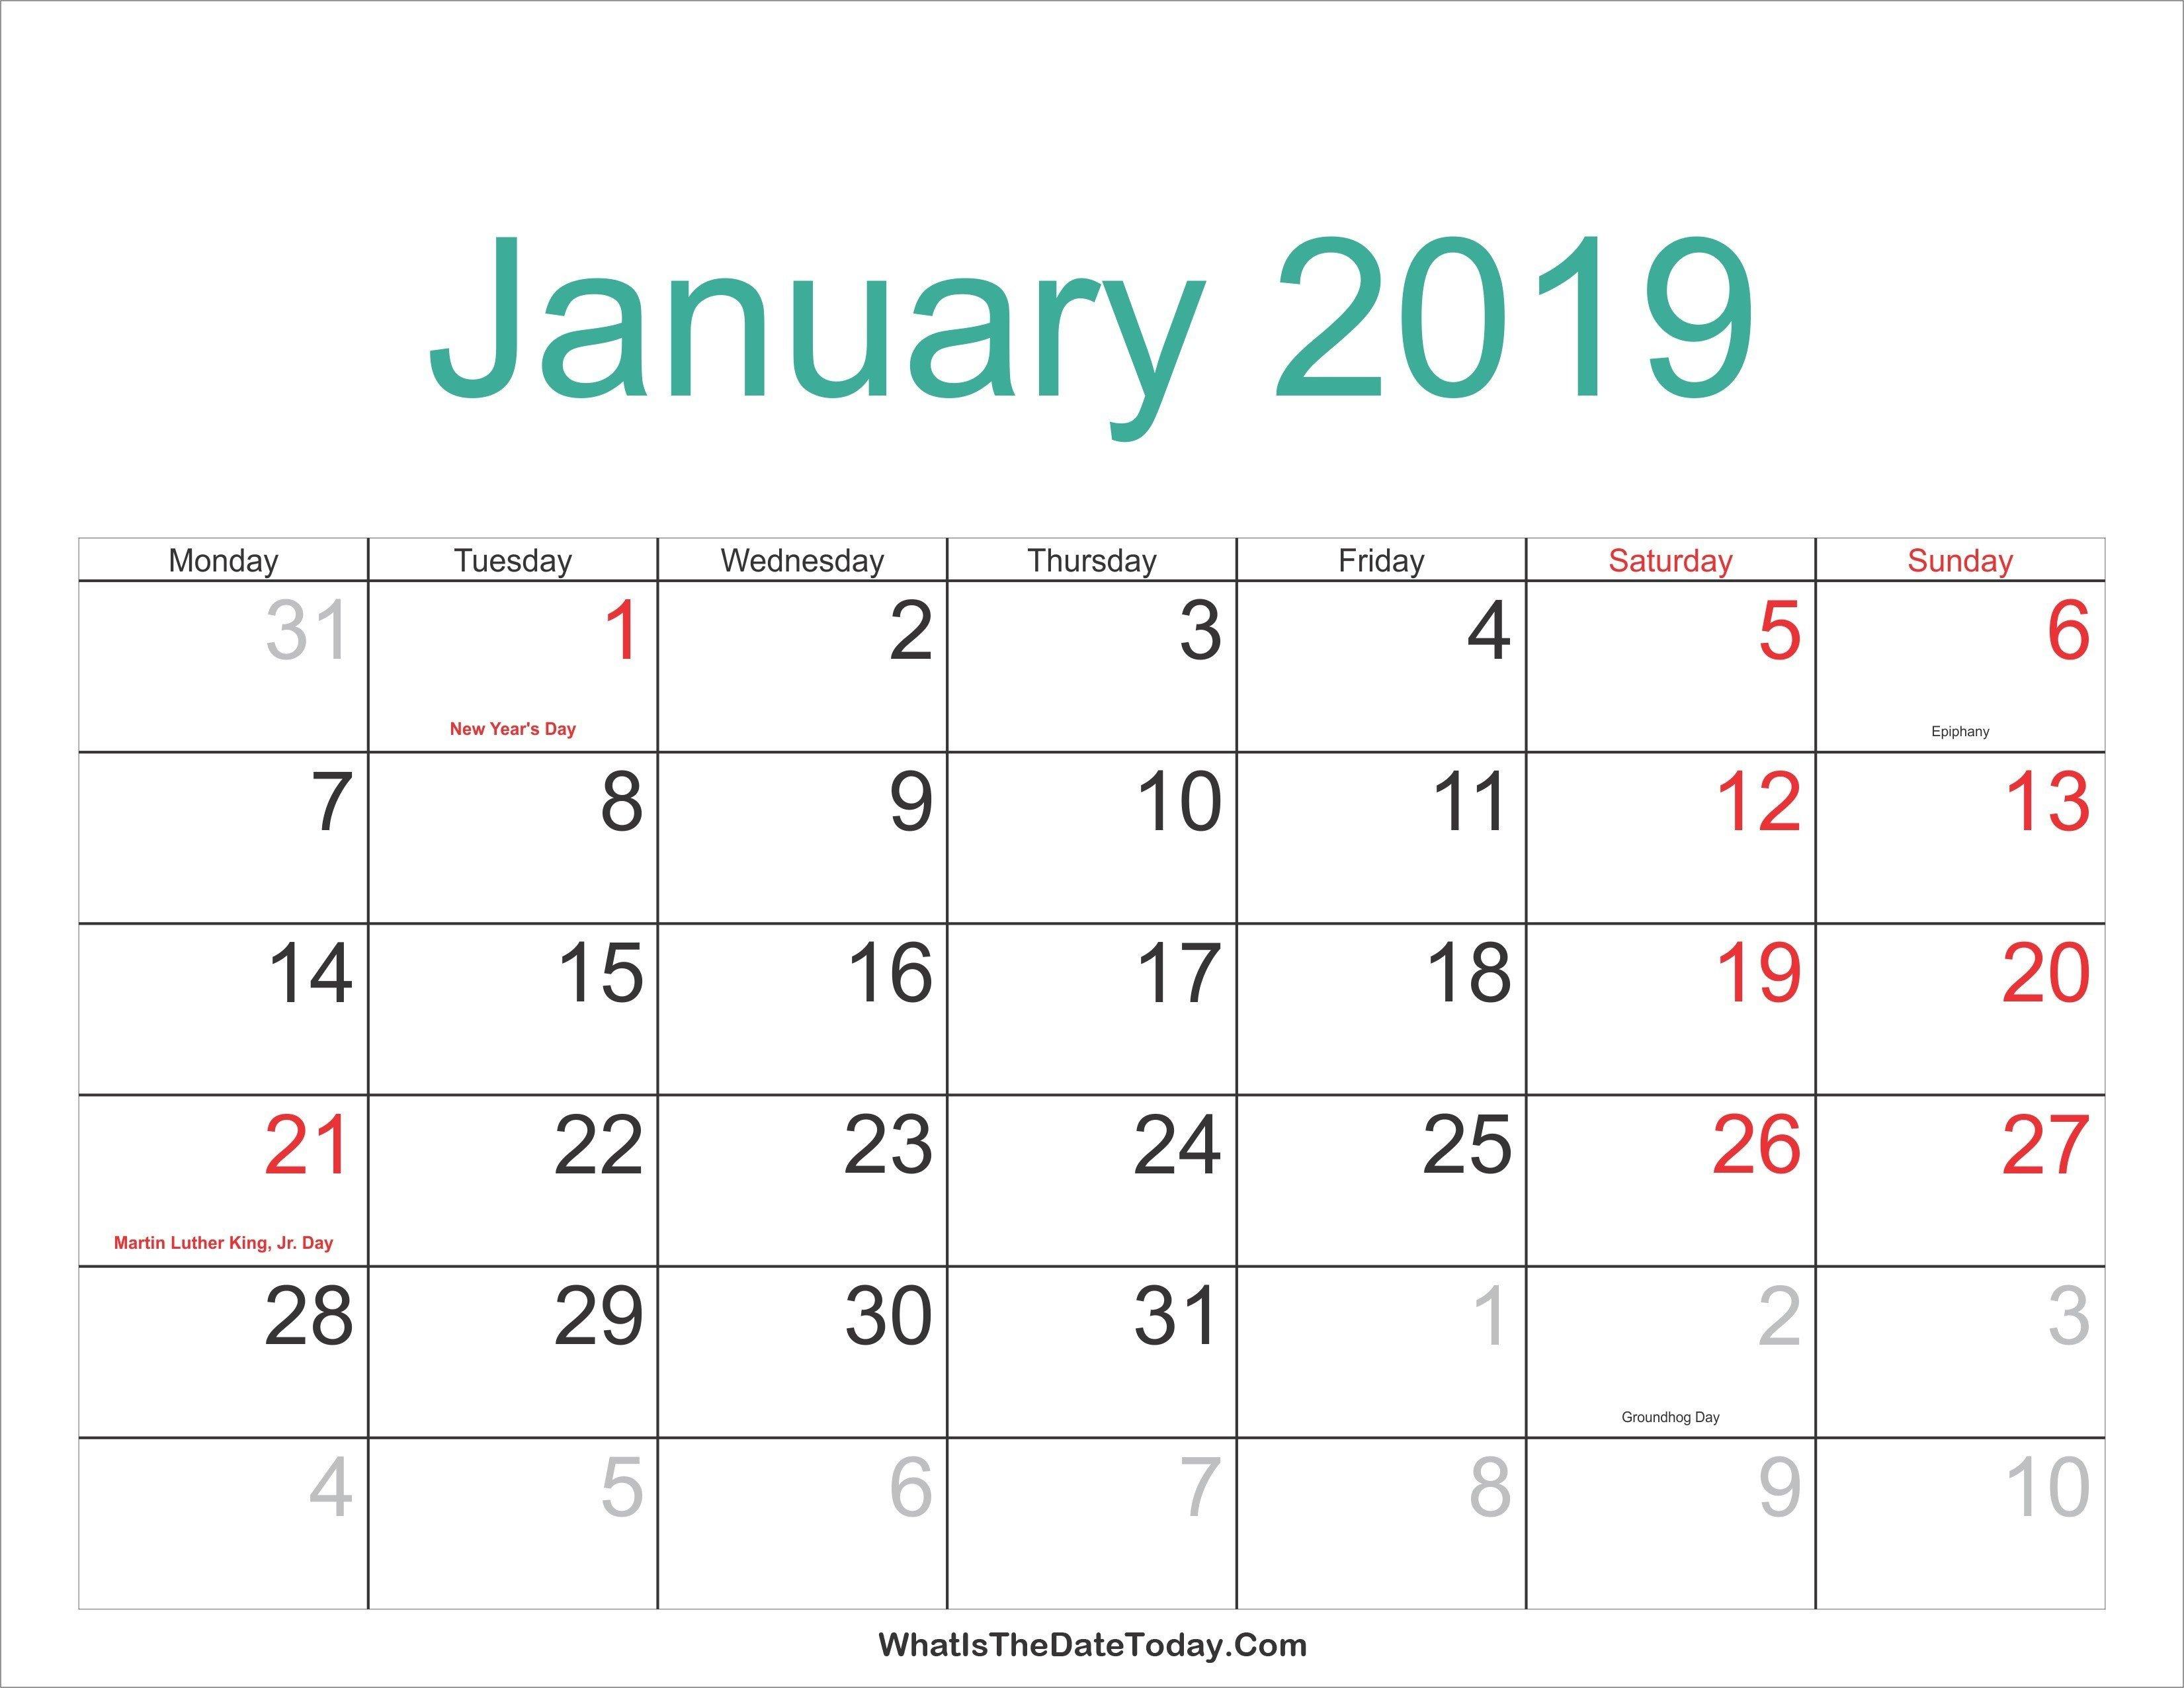 Malayalam Calendar 2019 June Printable 2019 Calendars With Holidays P K Krishnan Calendar 2019